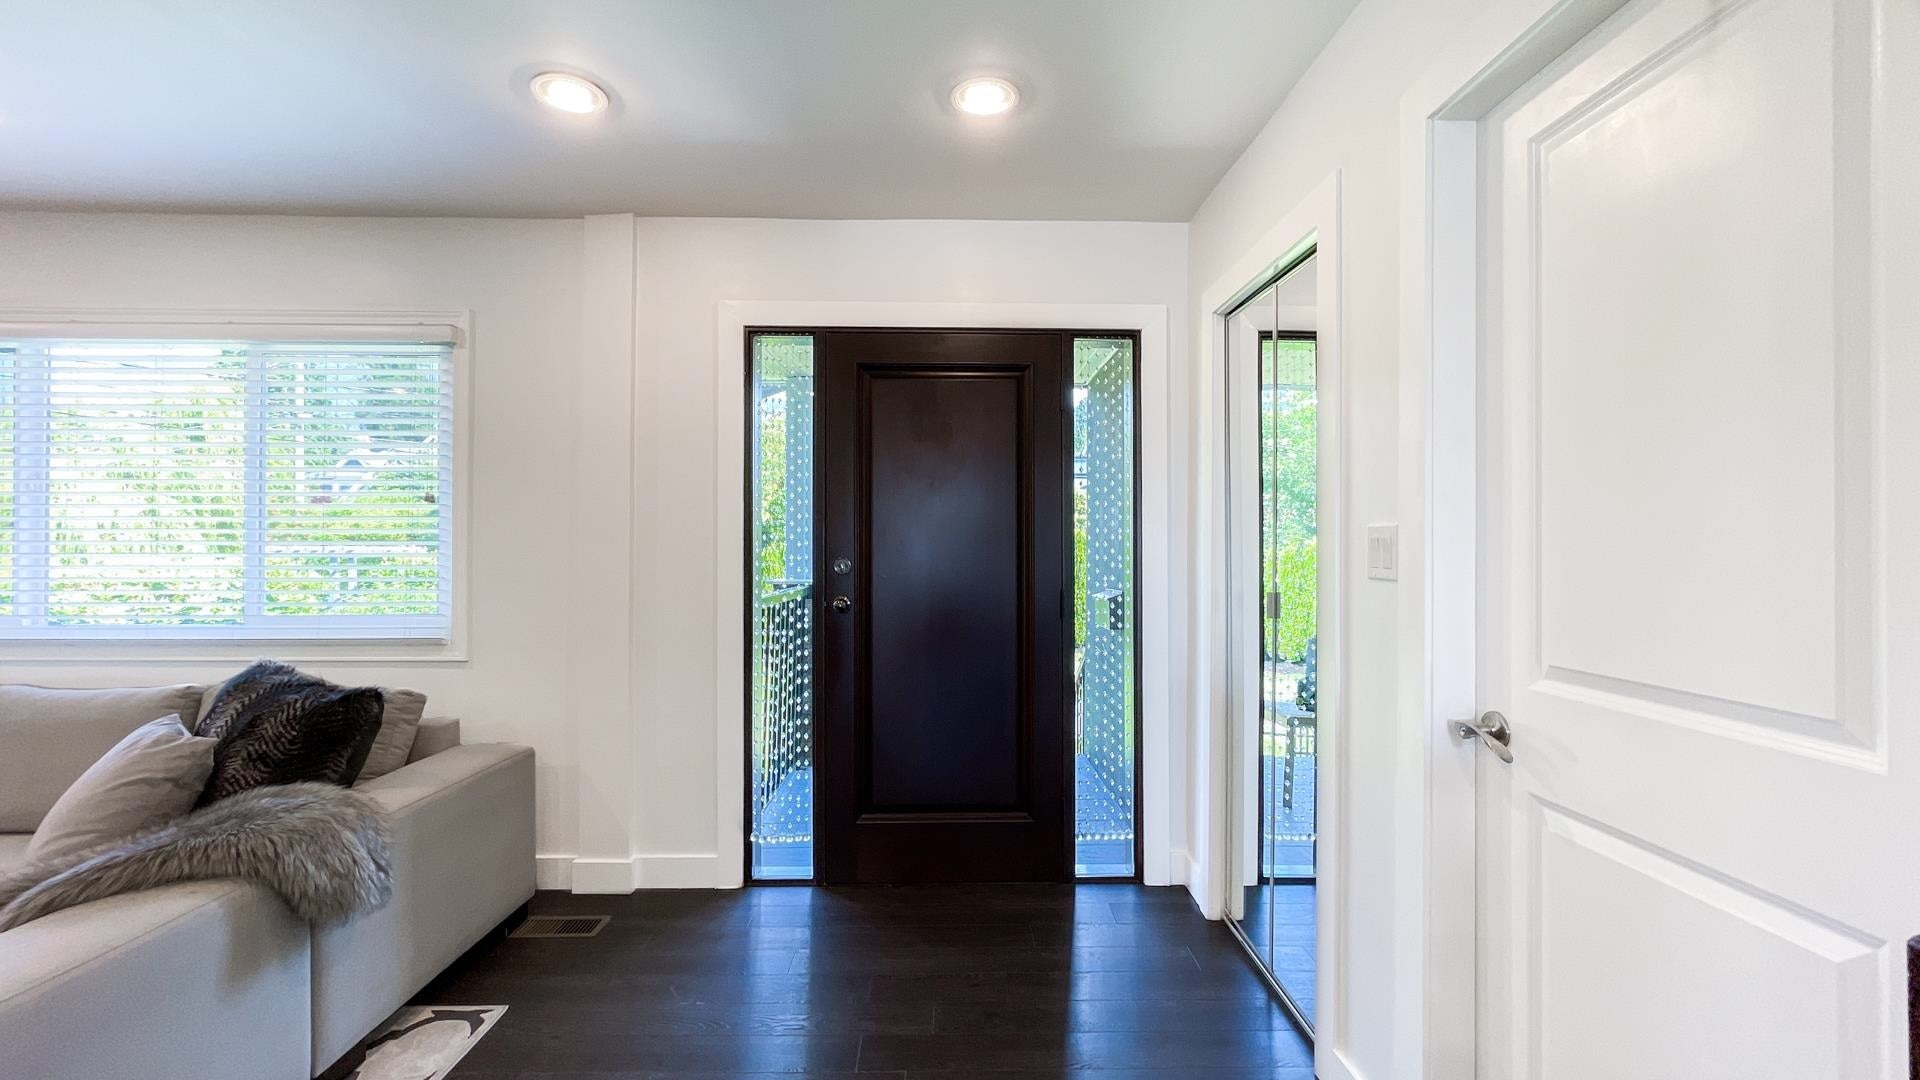 1168 JEFFERSON AVENUE - Ambleside House/Single Family for sale, 6 Bedrooms (R2602275) - #2